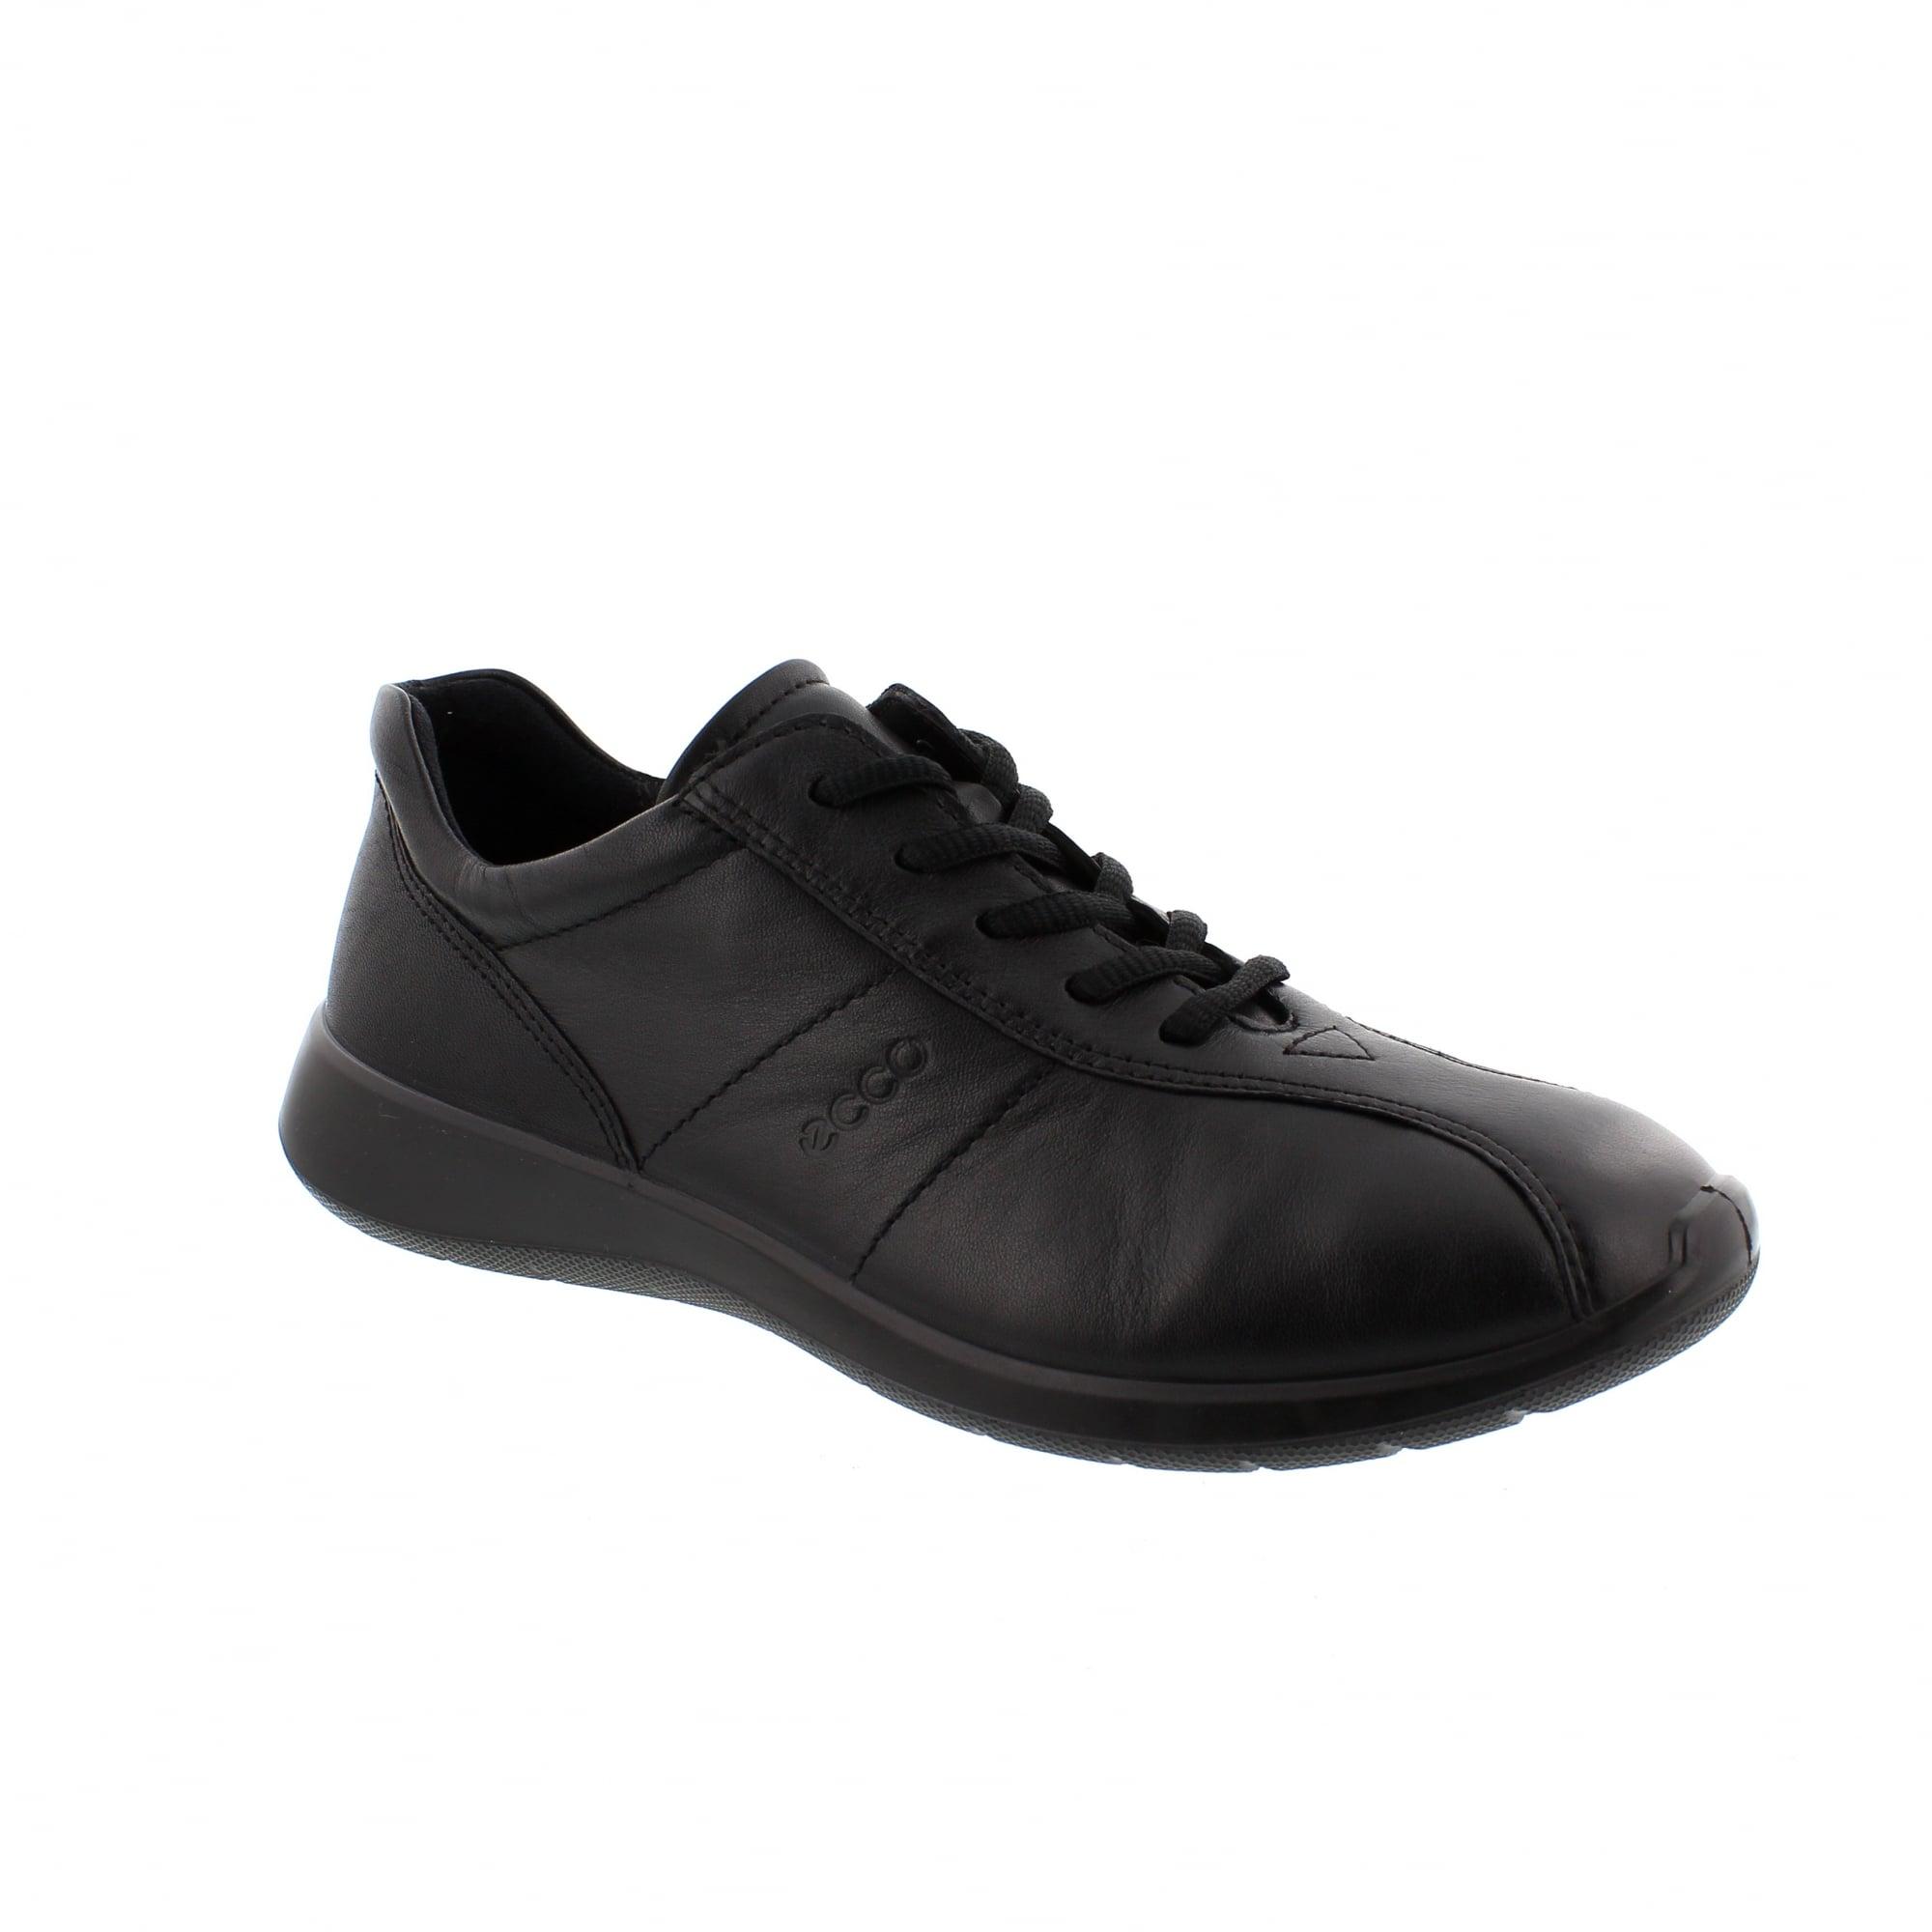 8cb287bd1f77 Ecco Soft 5 283153-01001 Womens Shoes